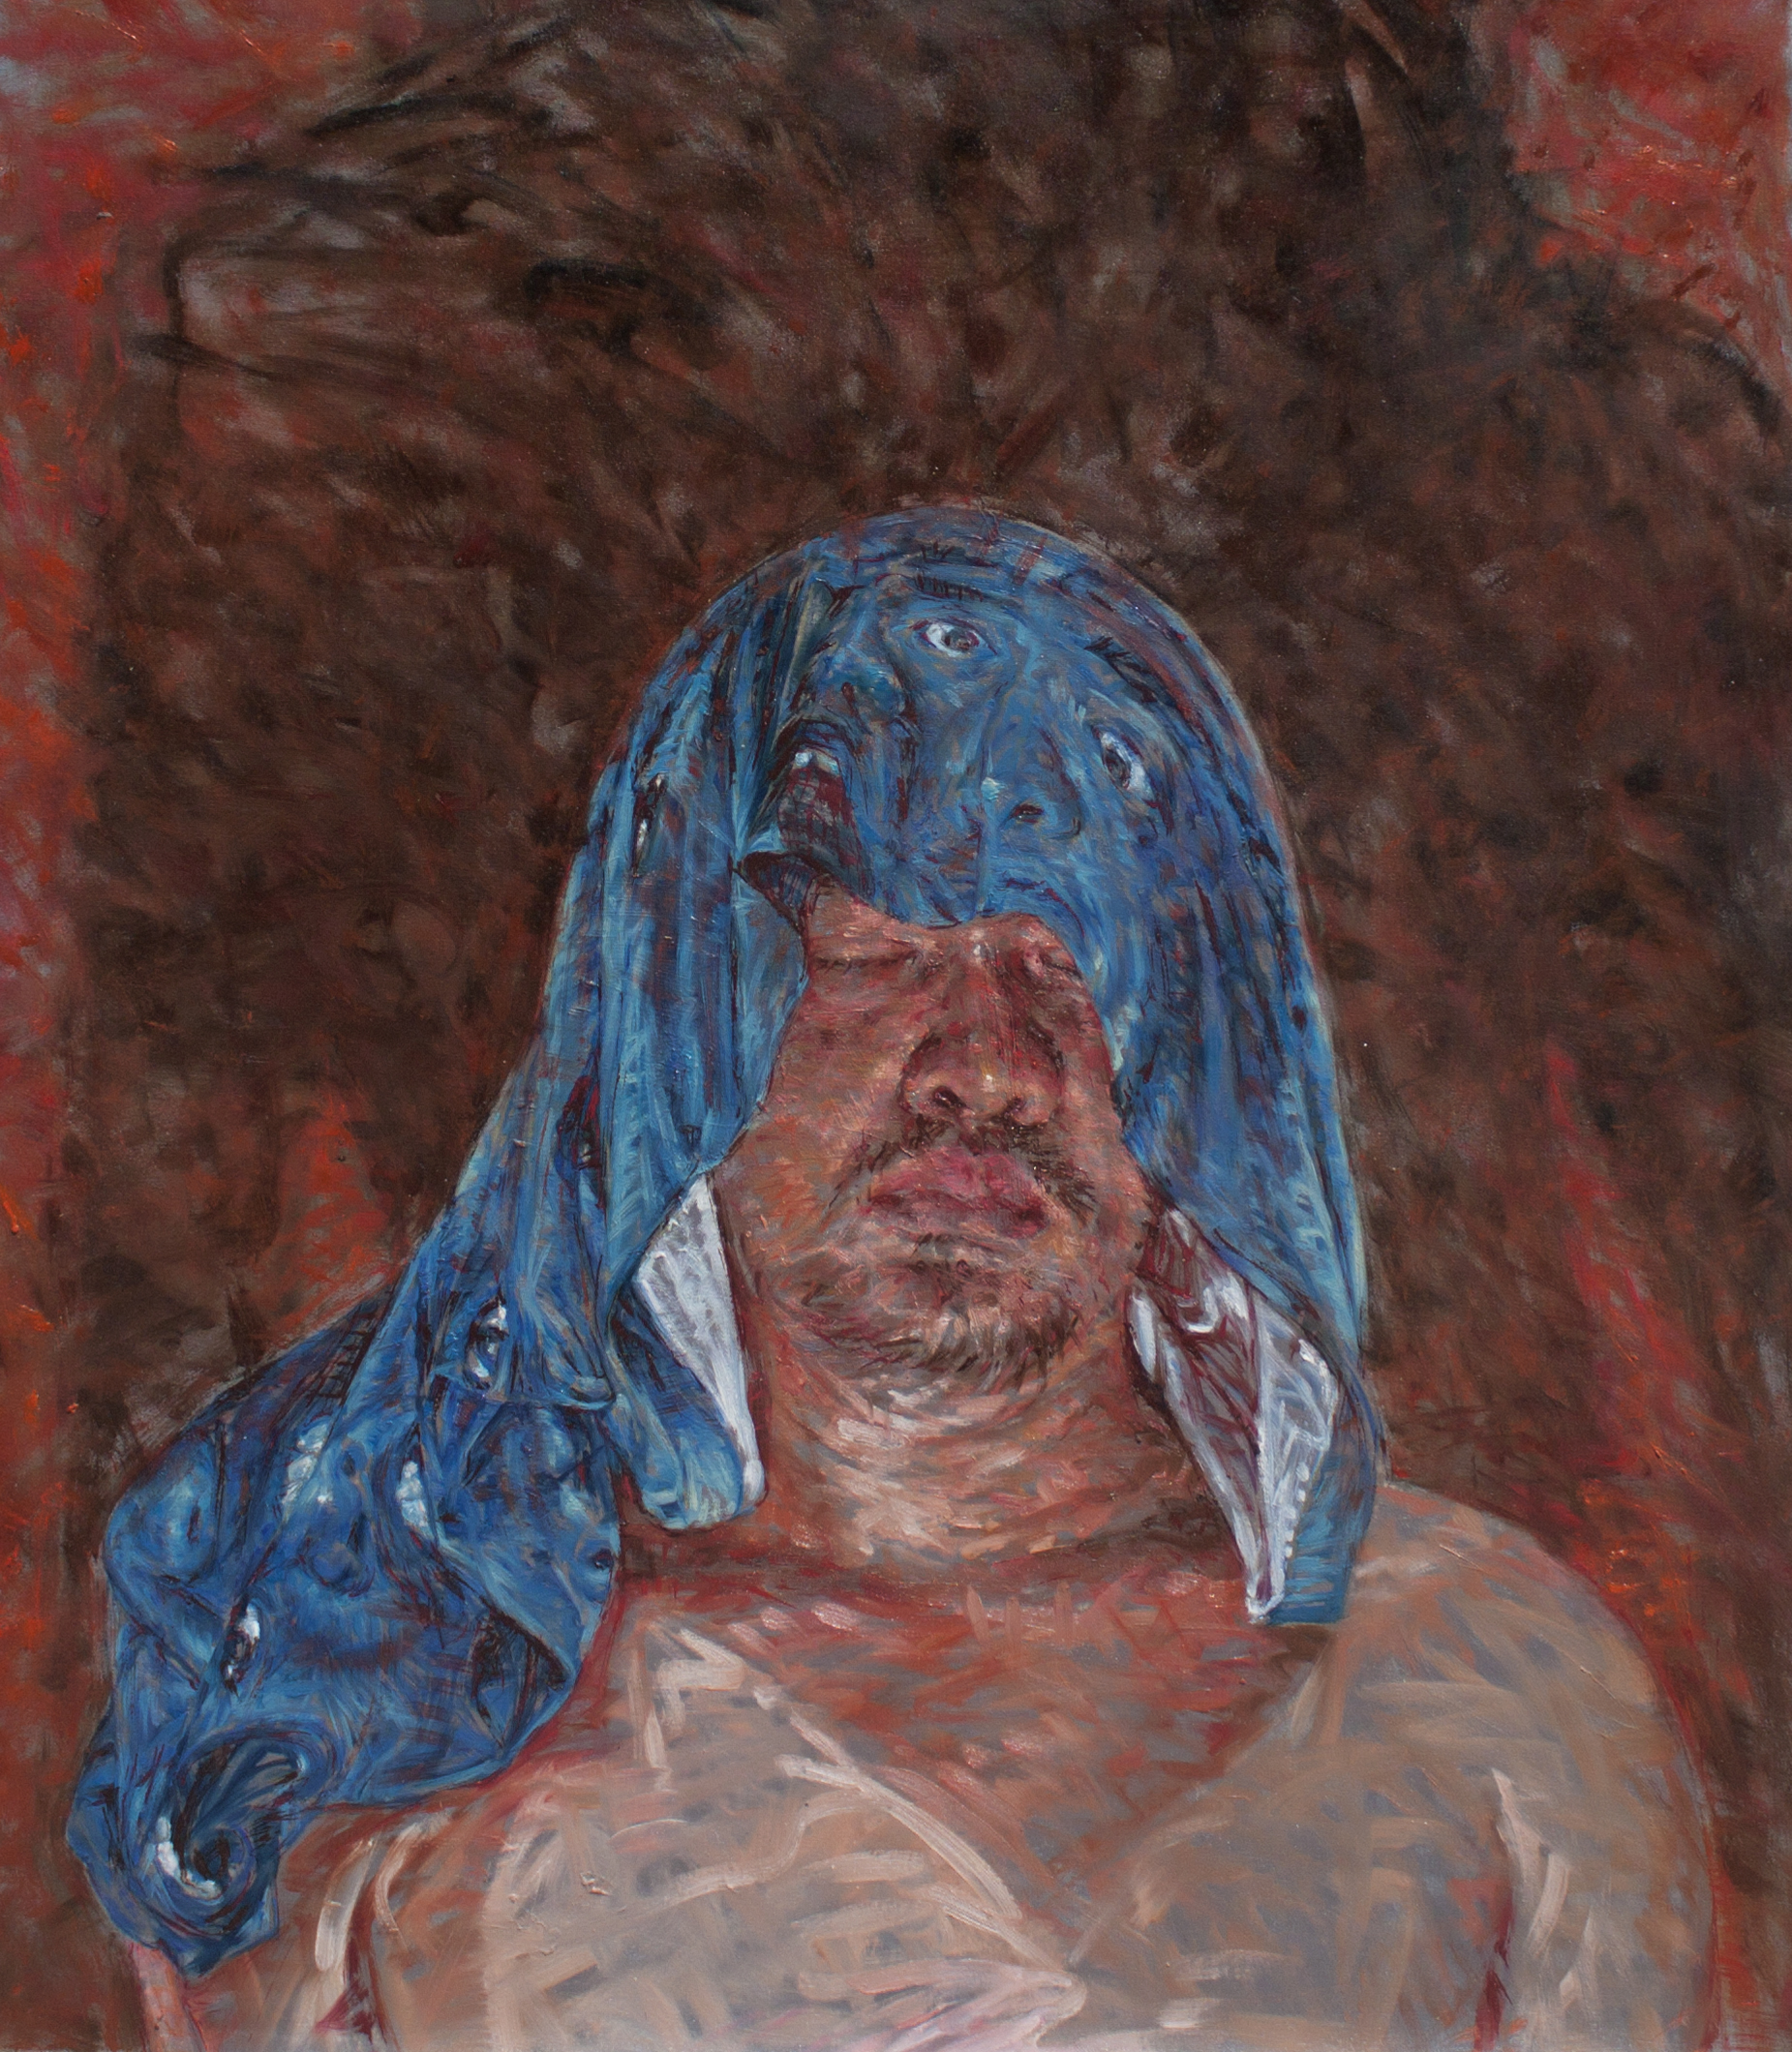 Self Portrait 2 (Moment to Moment) – Preecha